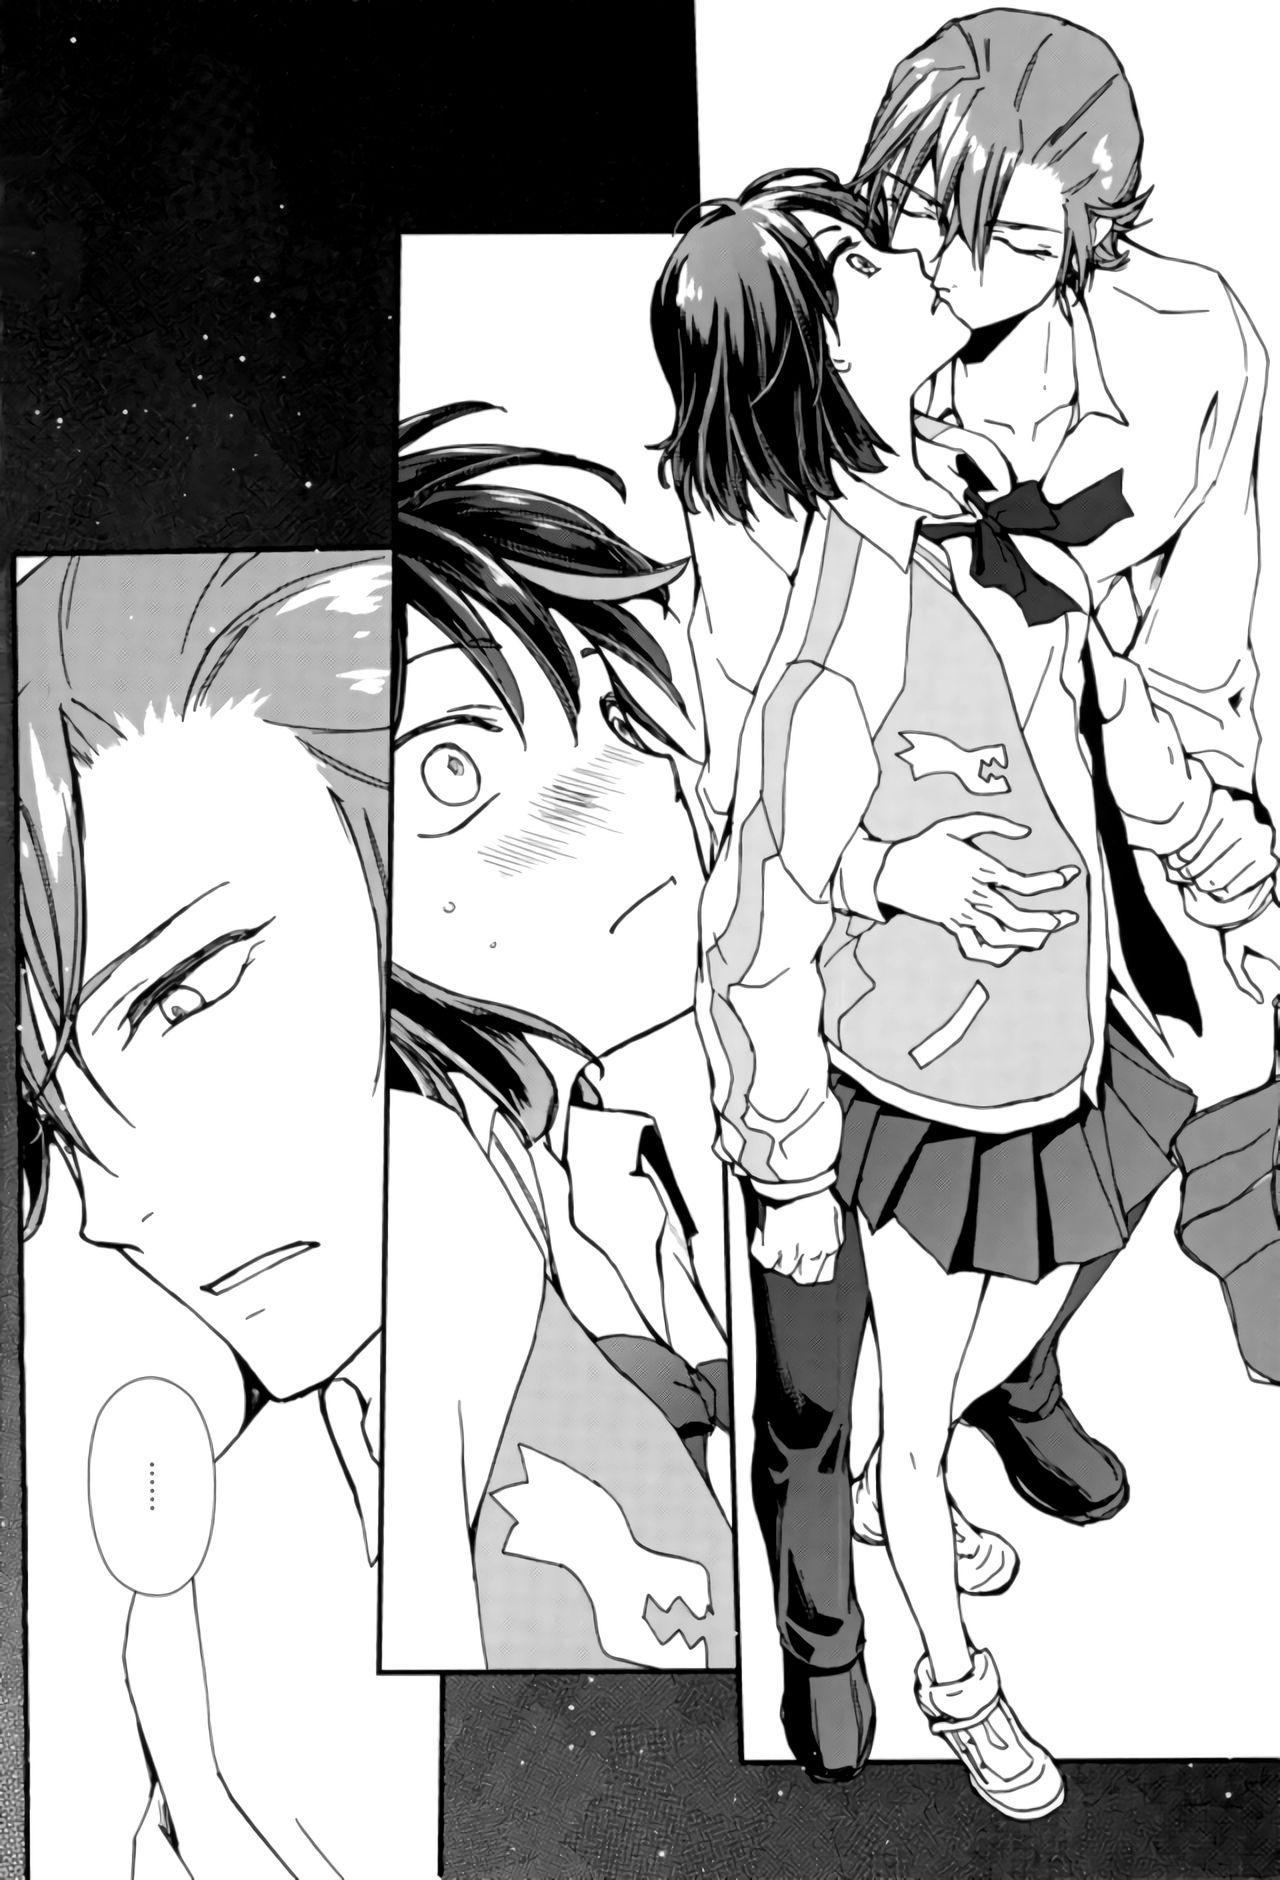 Sekai de Ichiban Kimi ga Suki | You mean the world to me, I'll make love to you tonight. 4